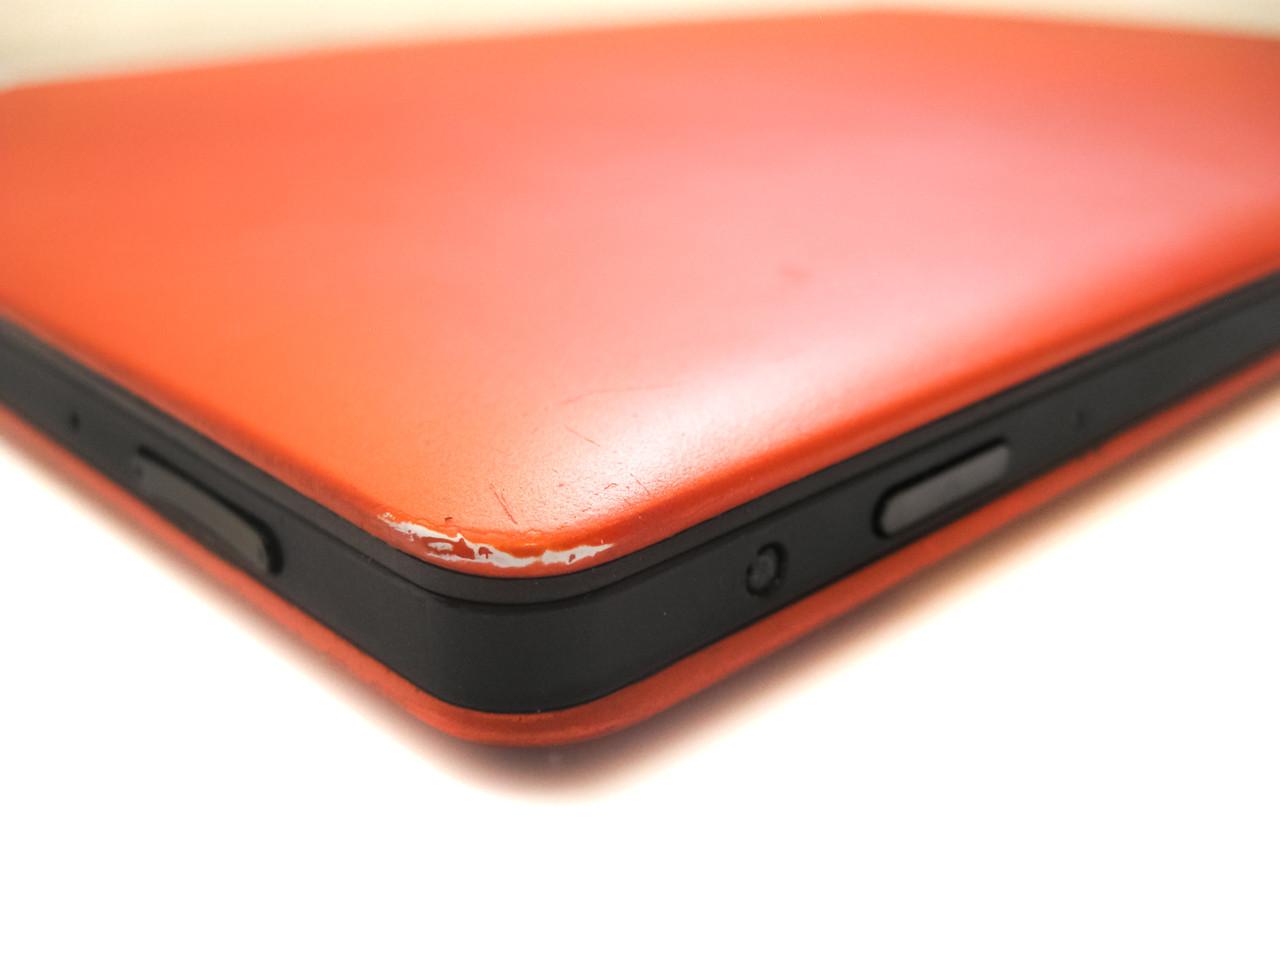 Трансформер Lenovo Yoga 13 IPS 13.3  (1600x900) / Intel Core i7-3517U  6